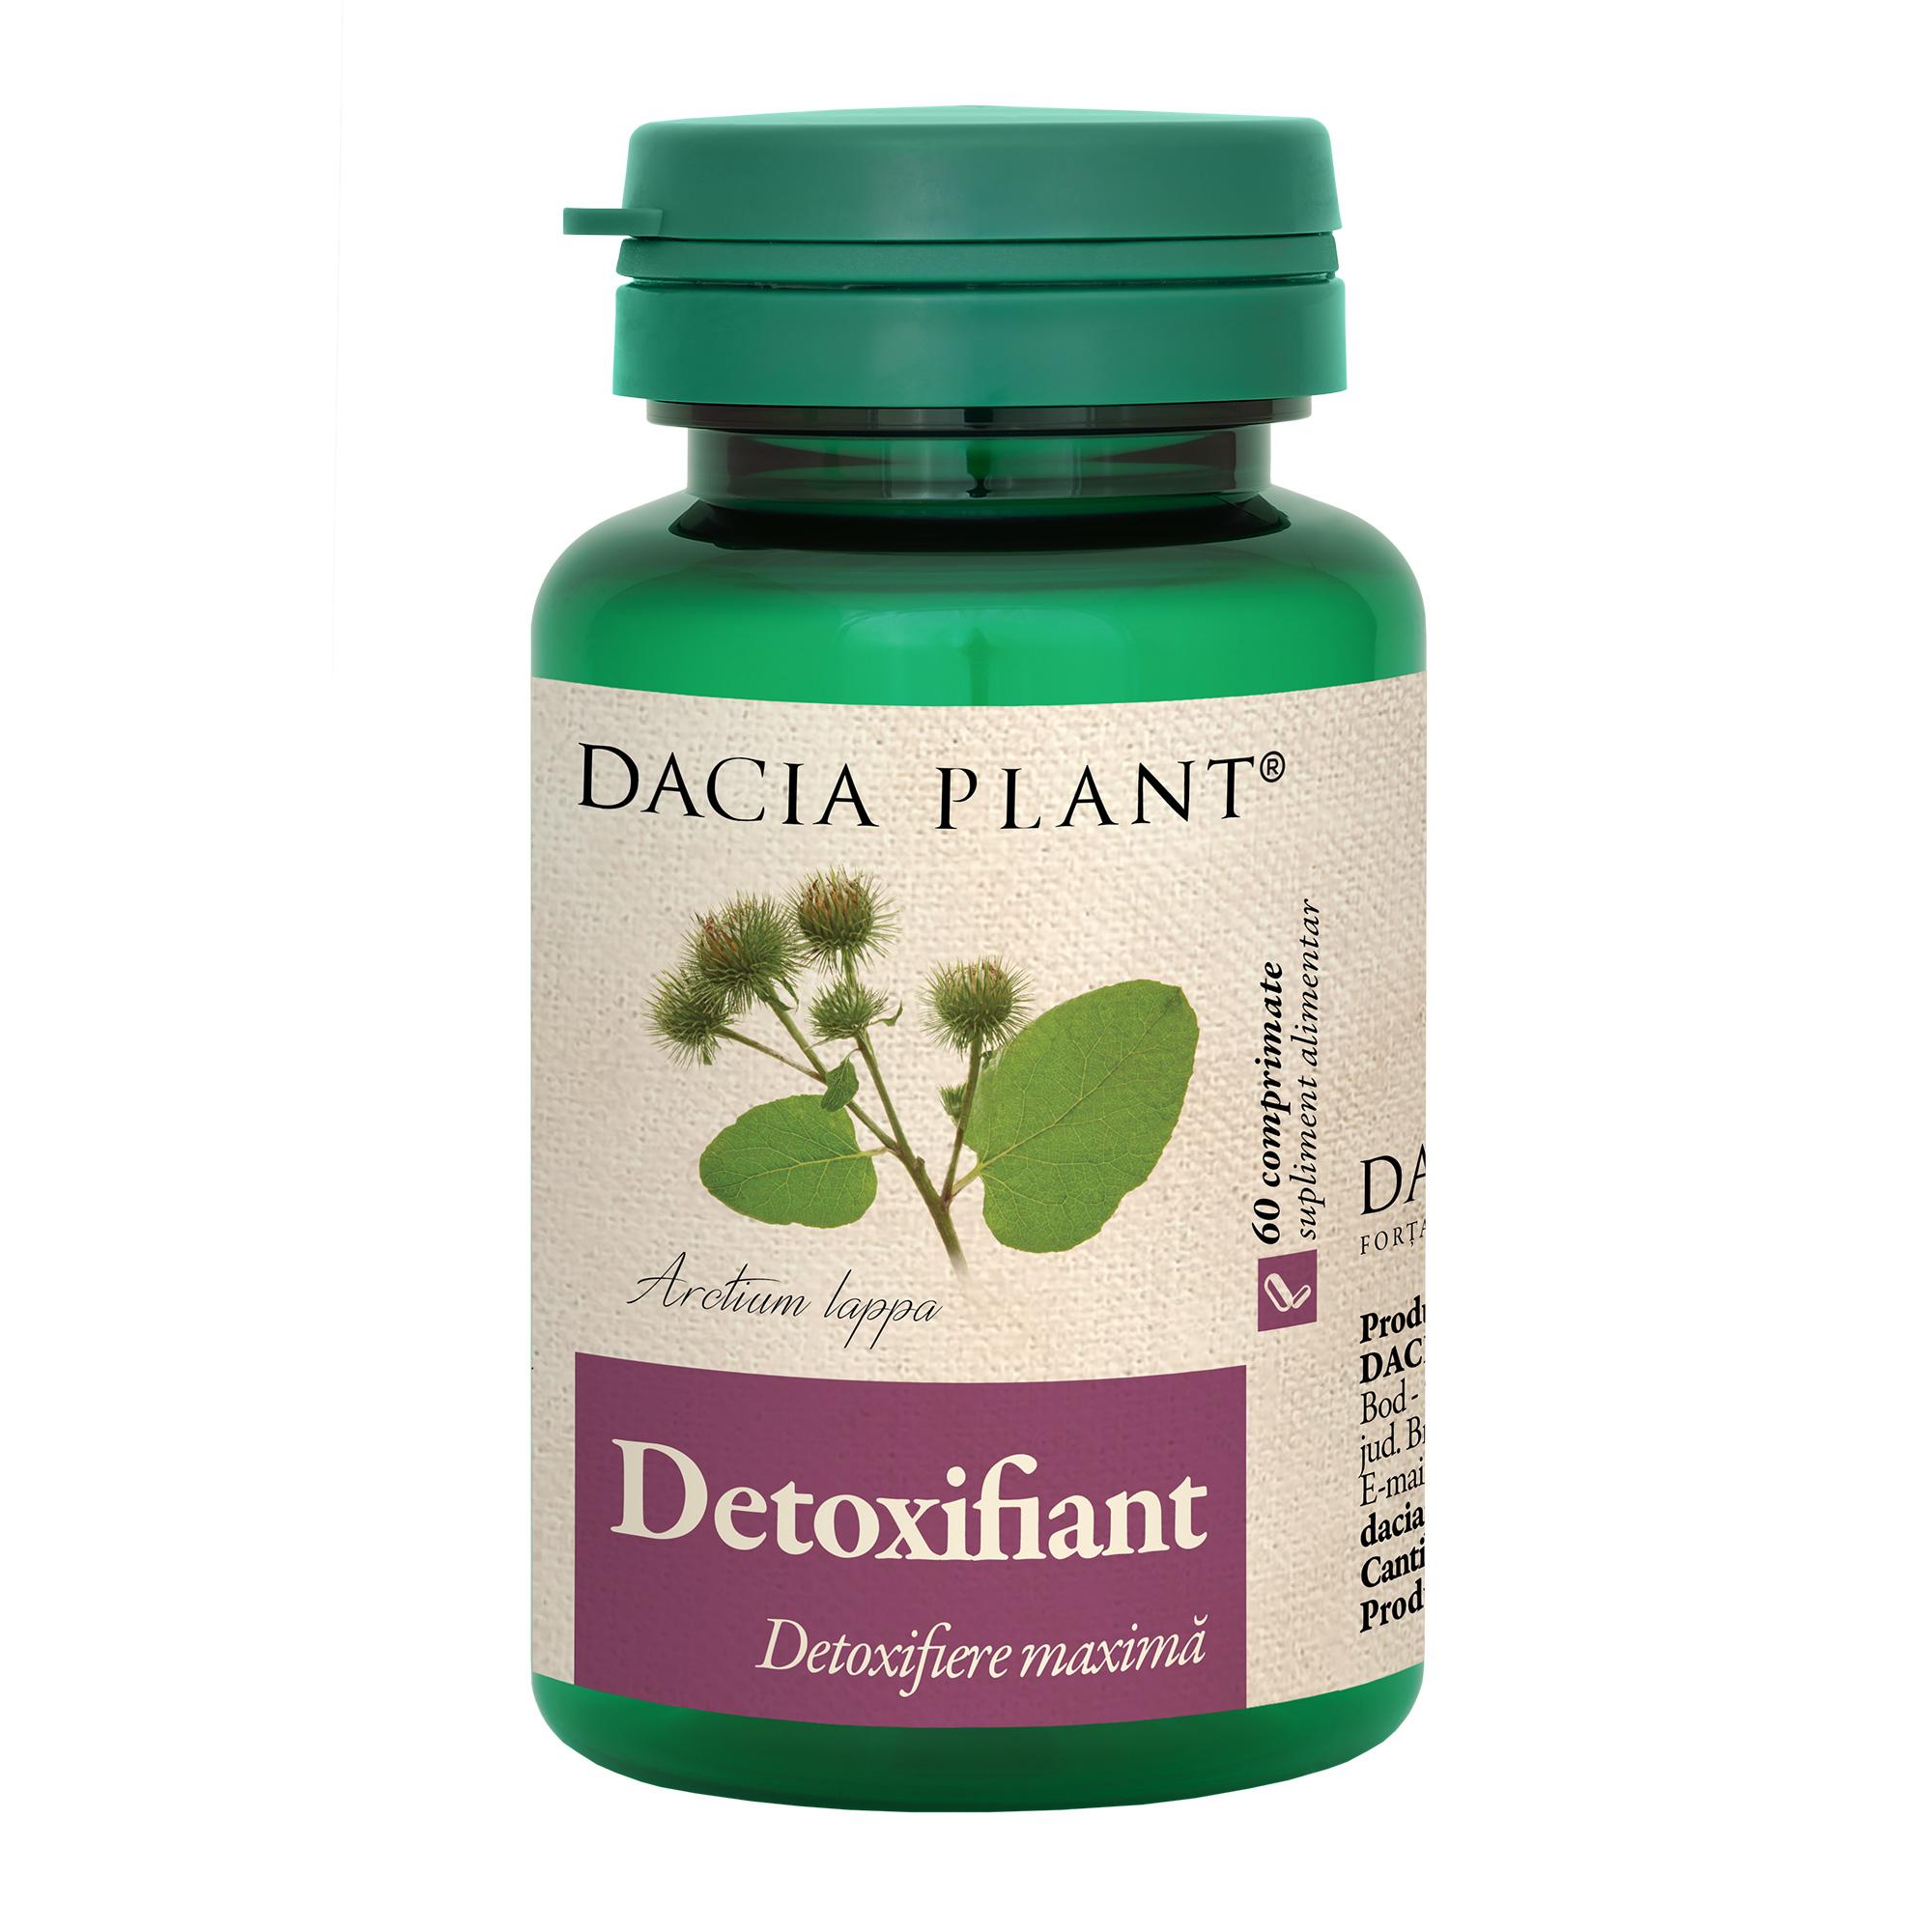 detoxifiere medicamente papillomavirus dna replication